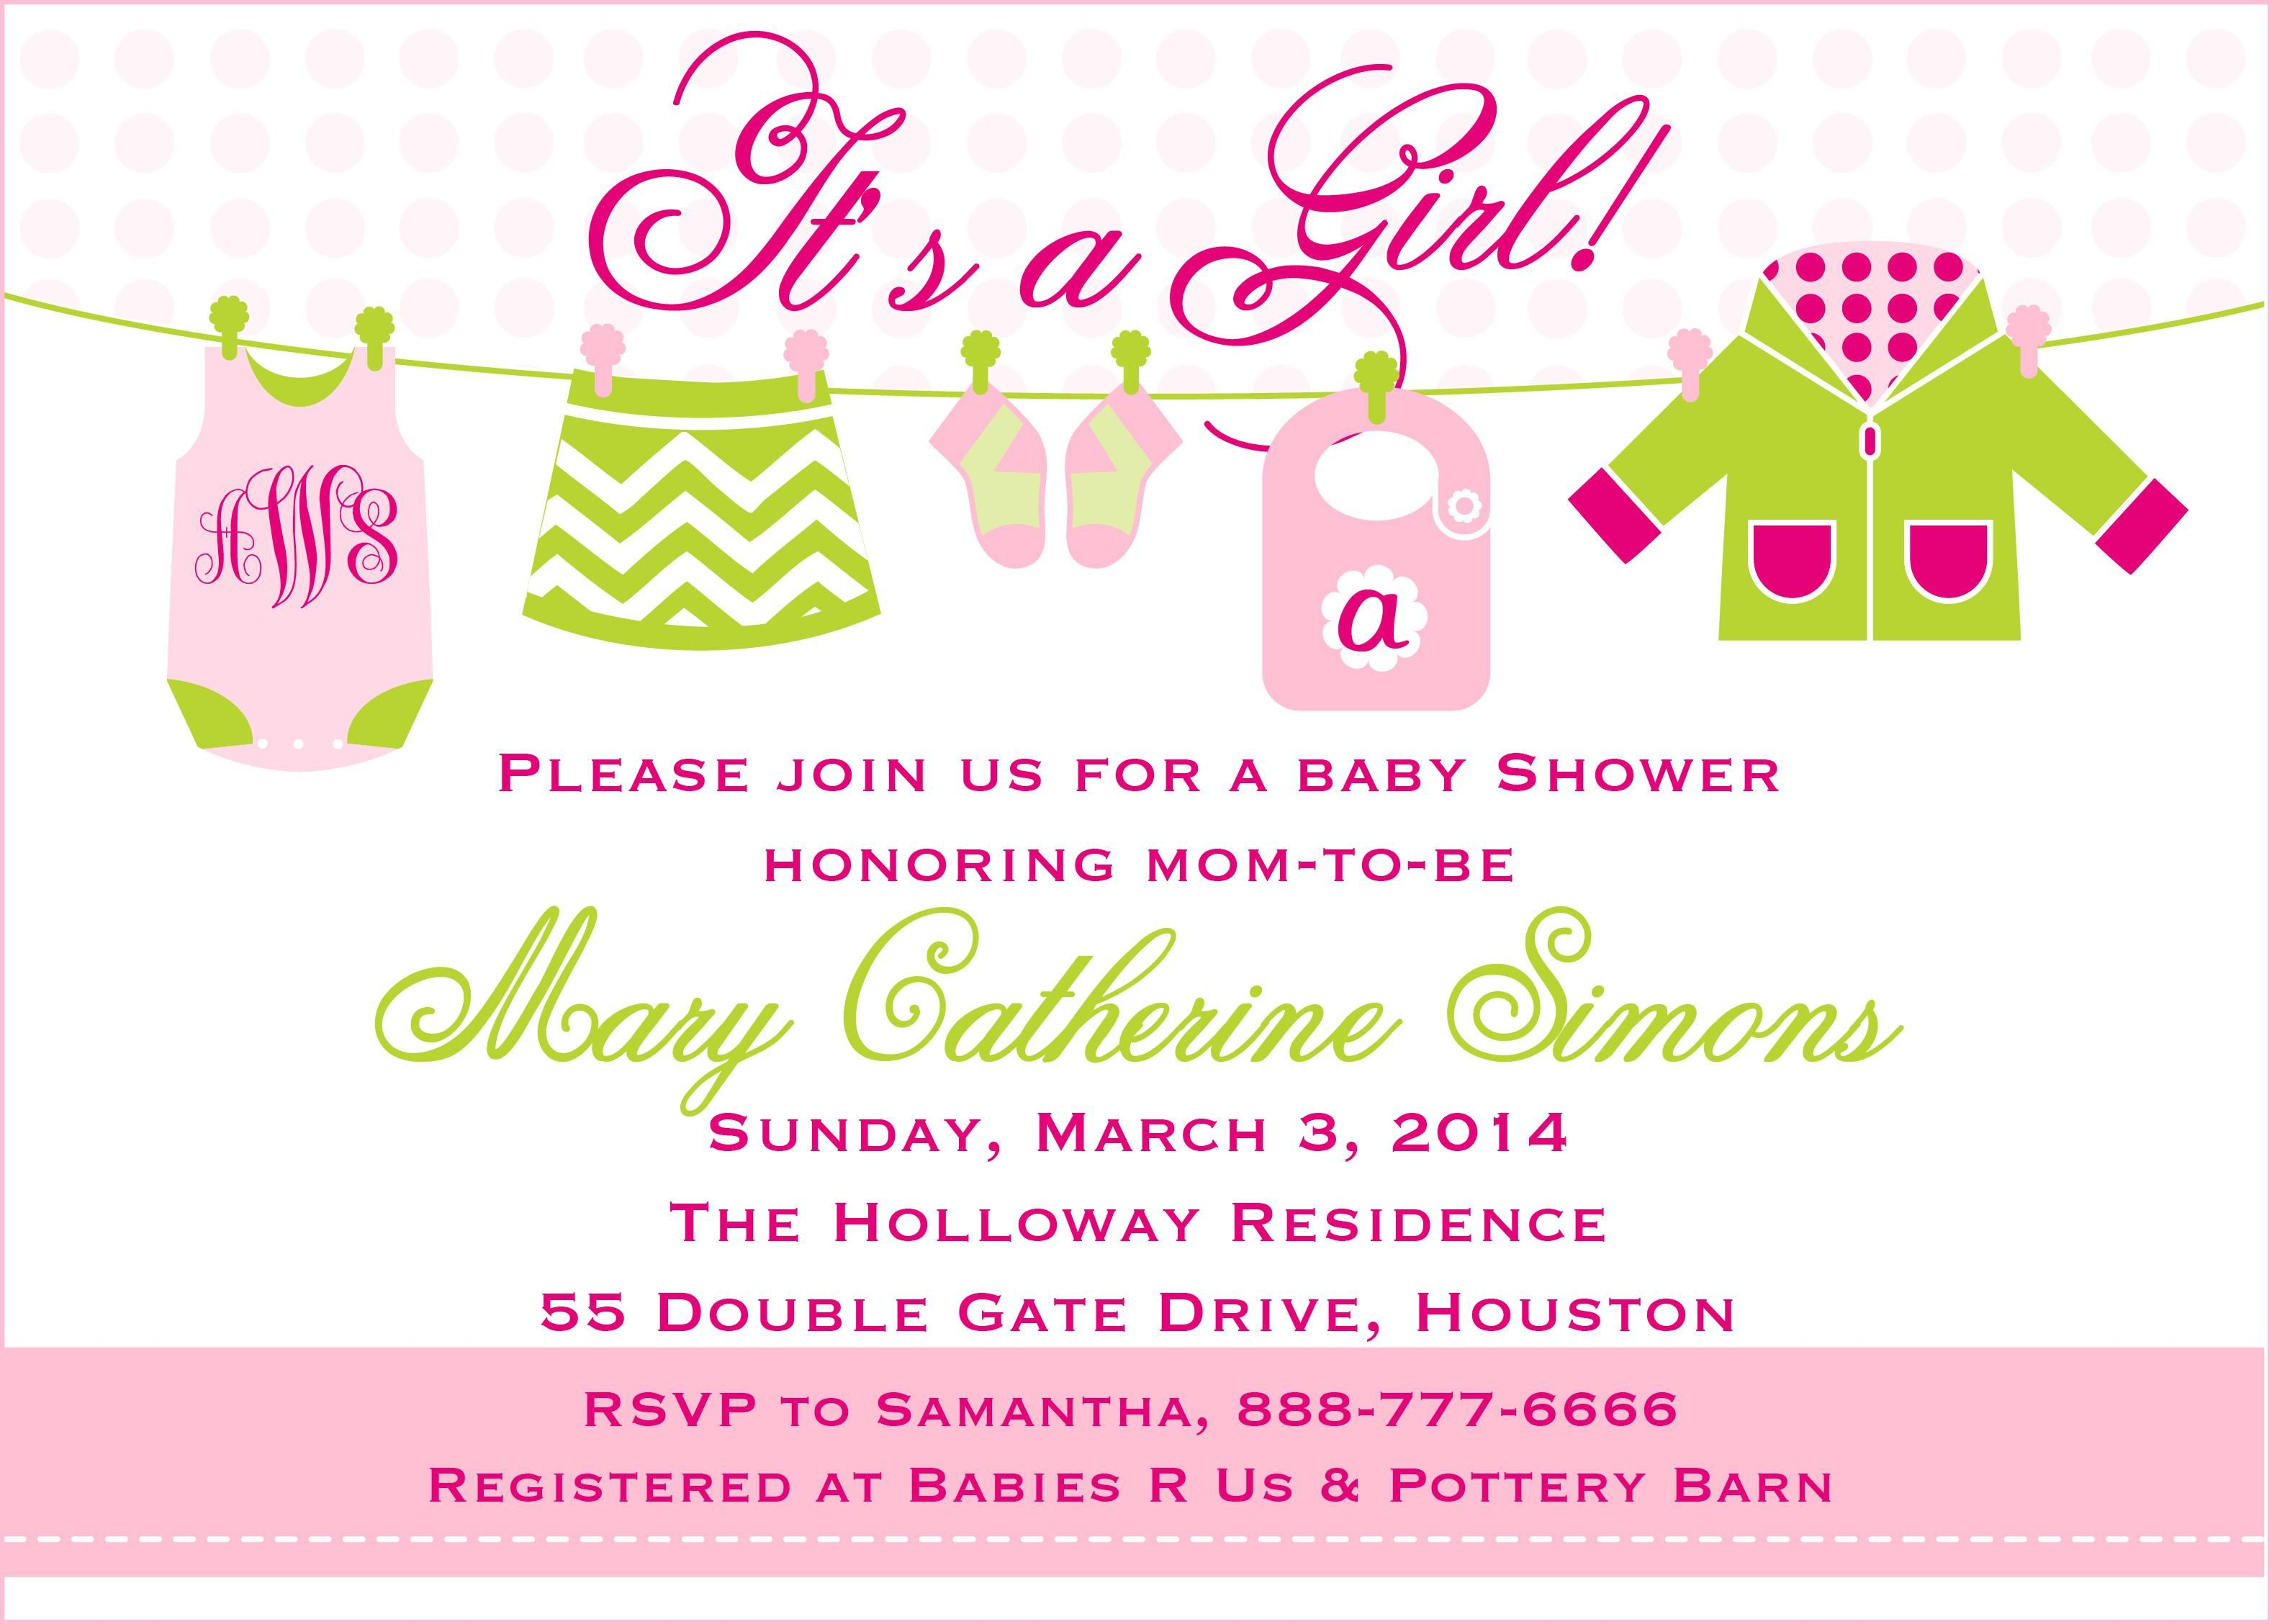 Baby shower invitation card baby shower invitation book instead baby shower invitation card baby shower invitation book instead card wording superb invitation stopboris Choice Image